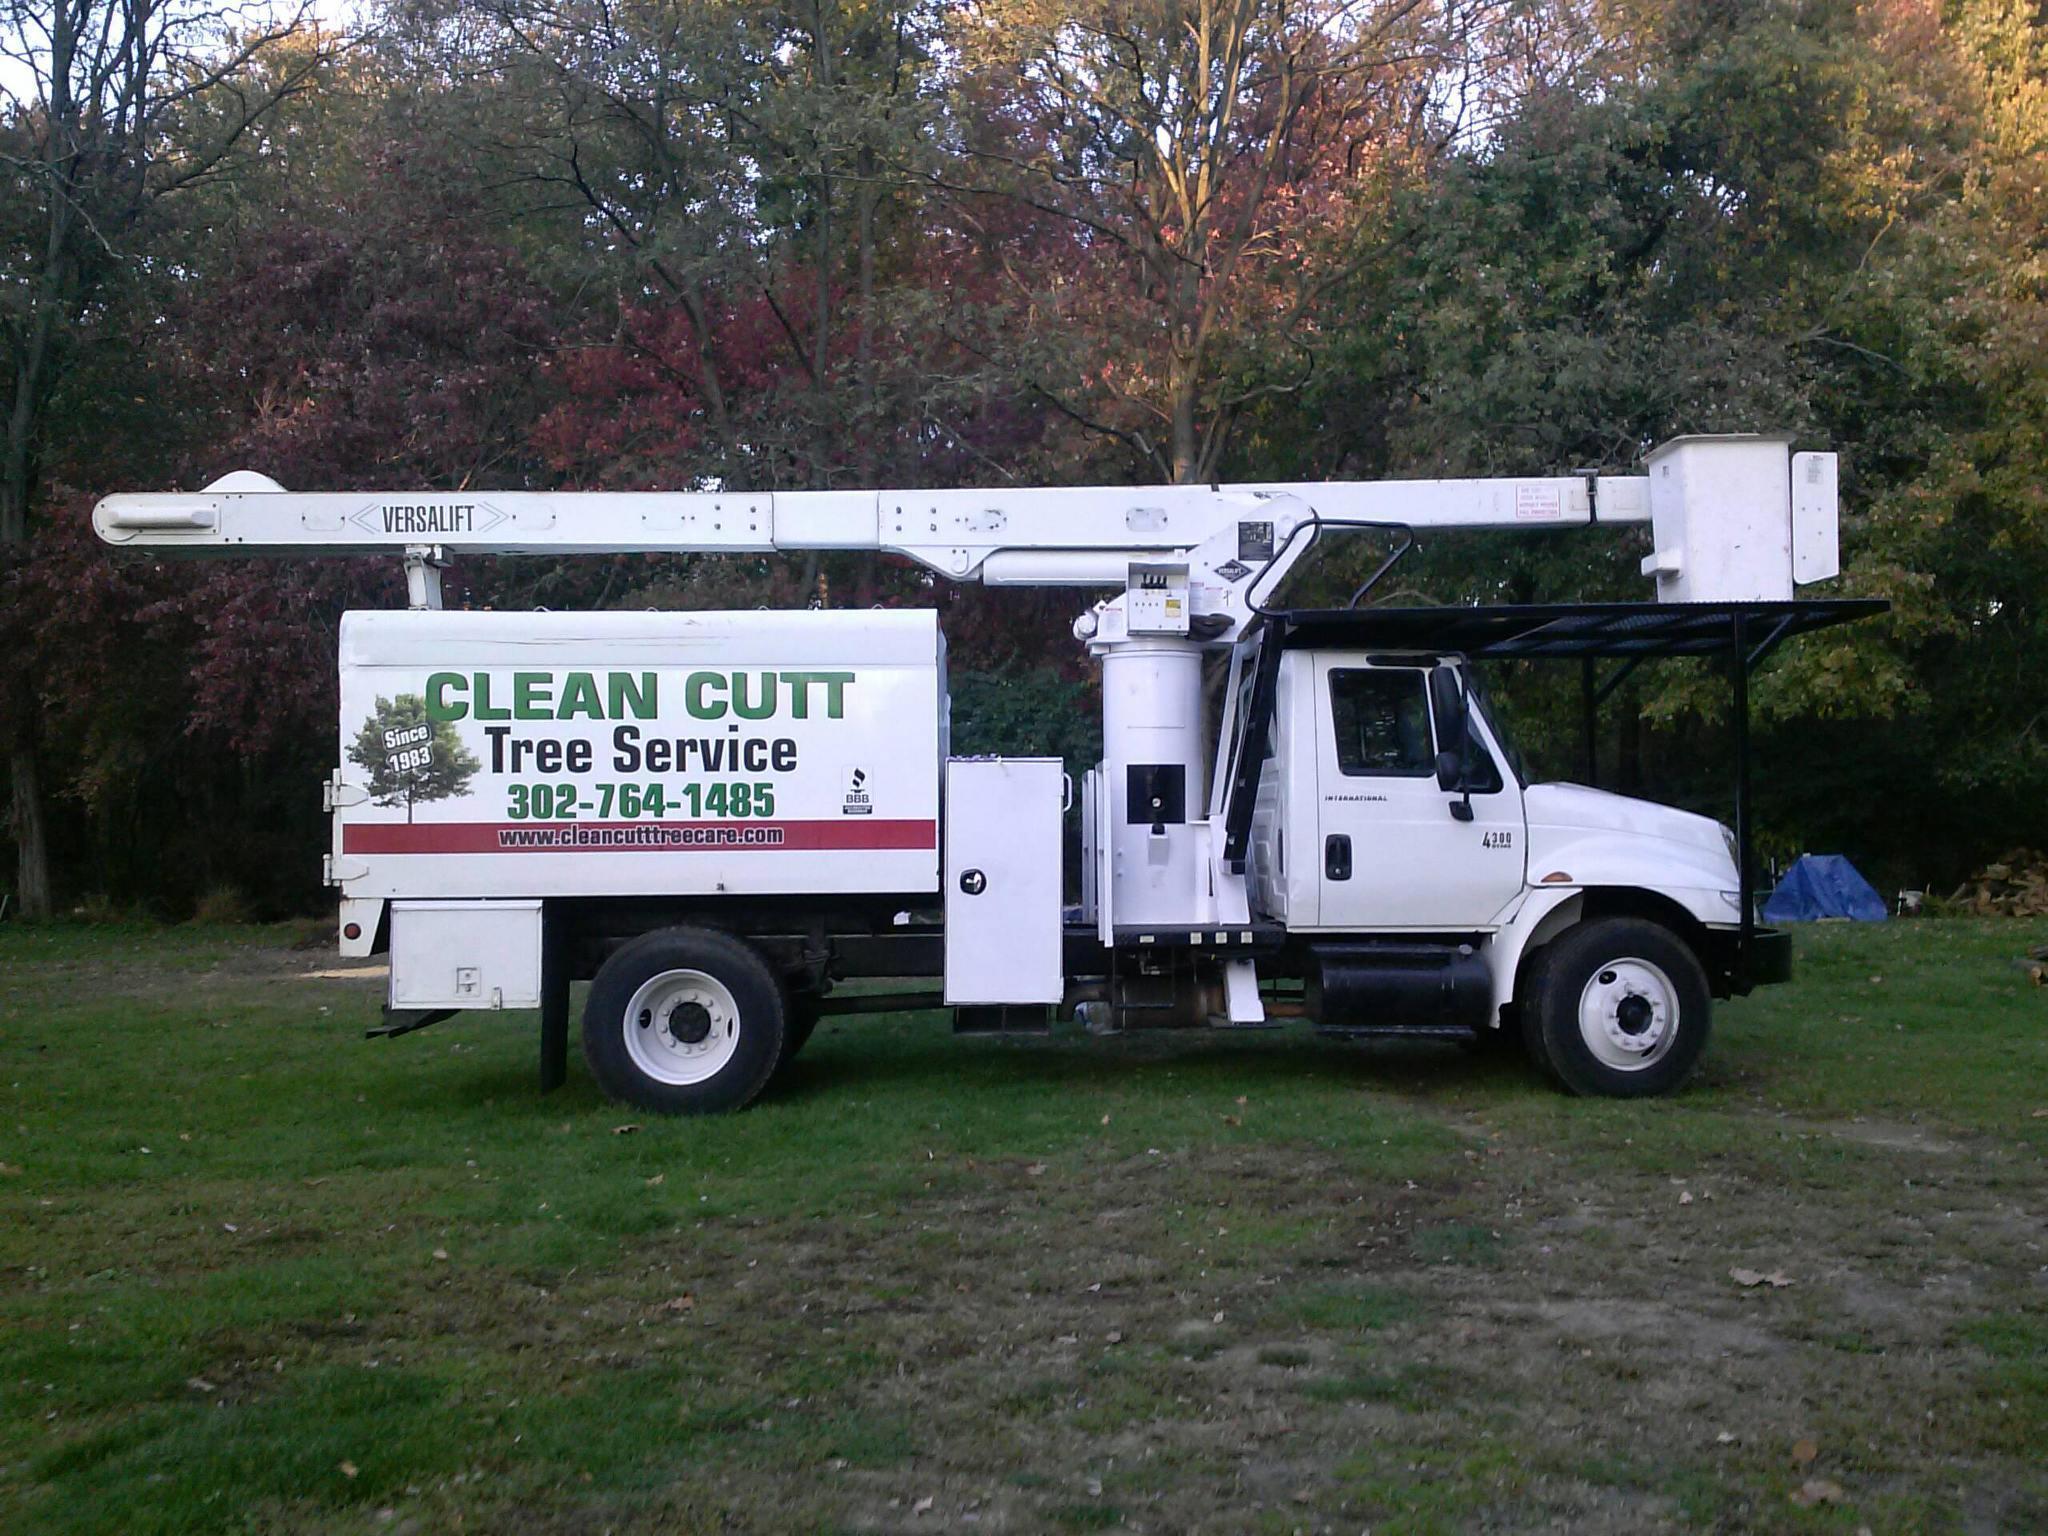 Clean Cutt Tree Service LLC image 1